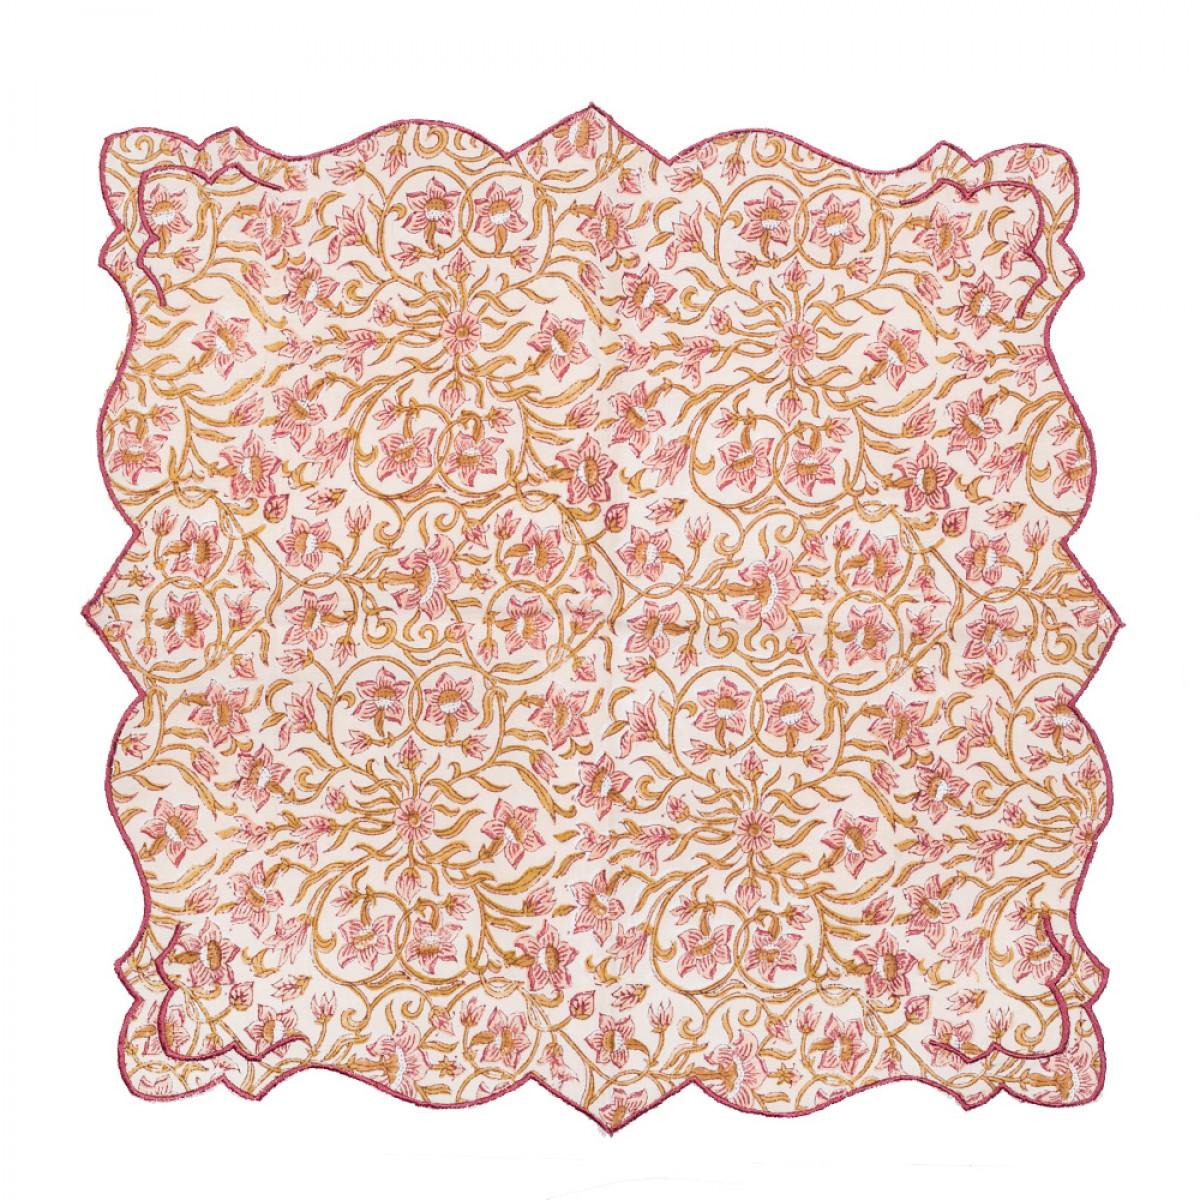 Cotton Scallop Embroidered Printed Napkin - Cream (Set of 6)